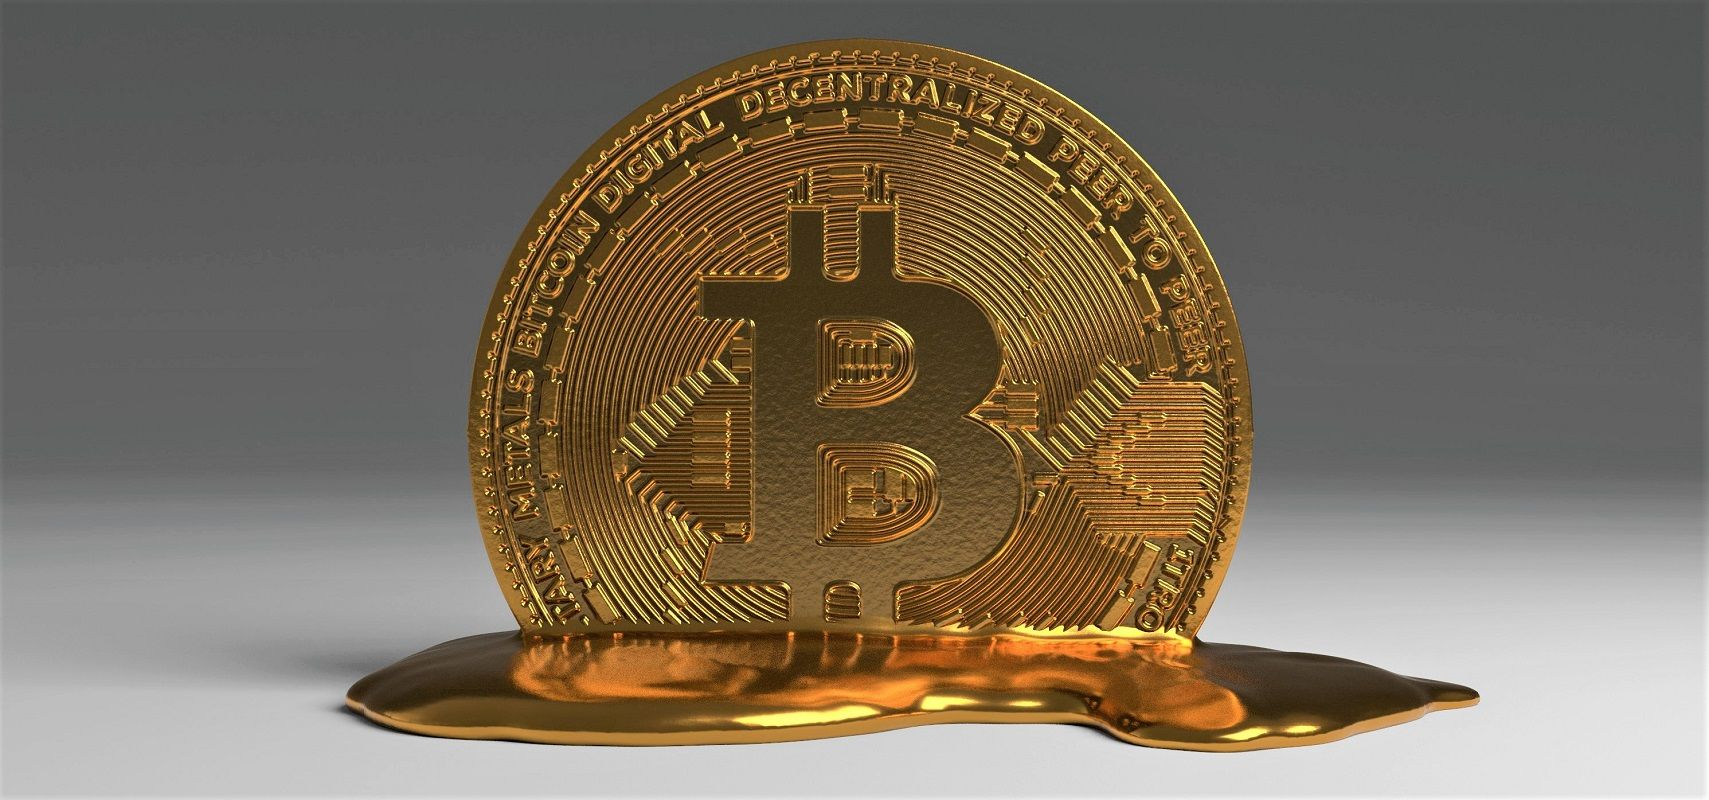 Bitcoin deflacionista 1